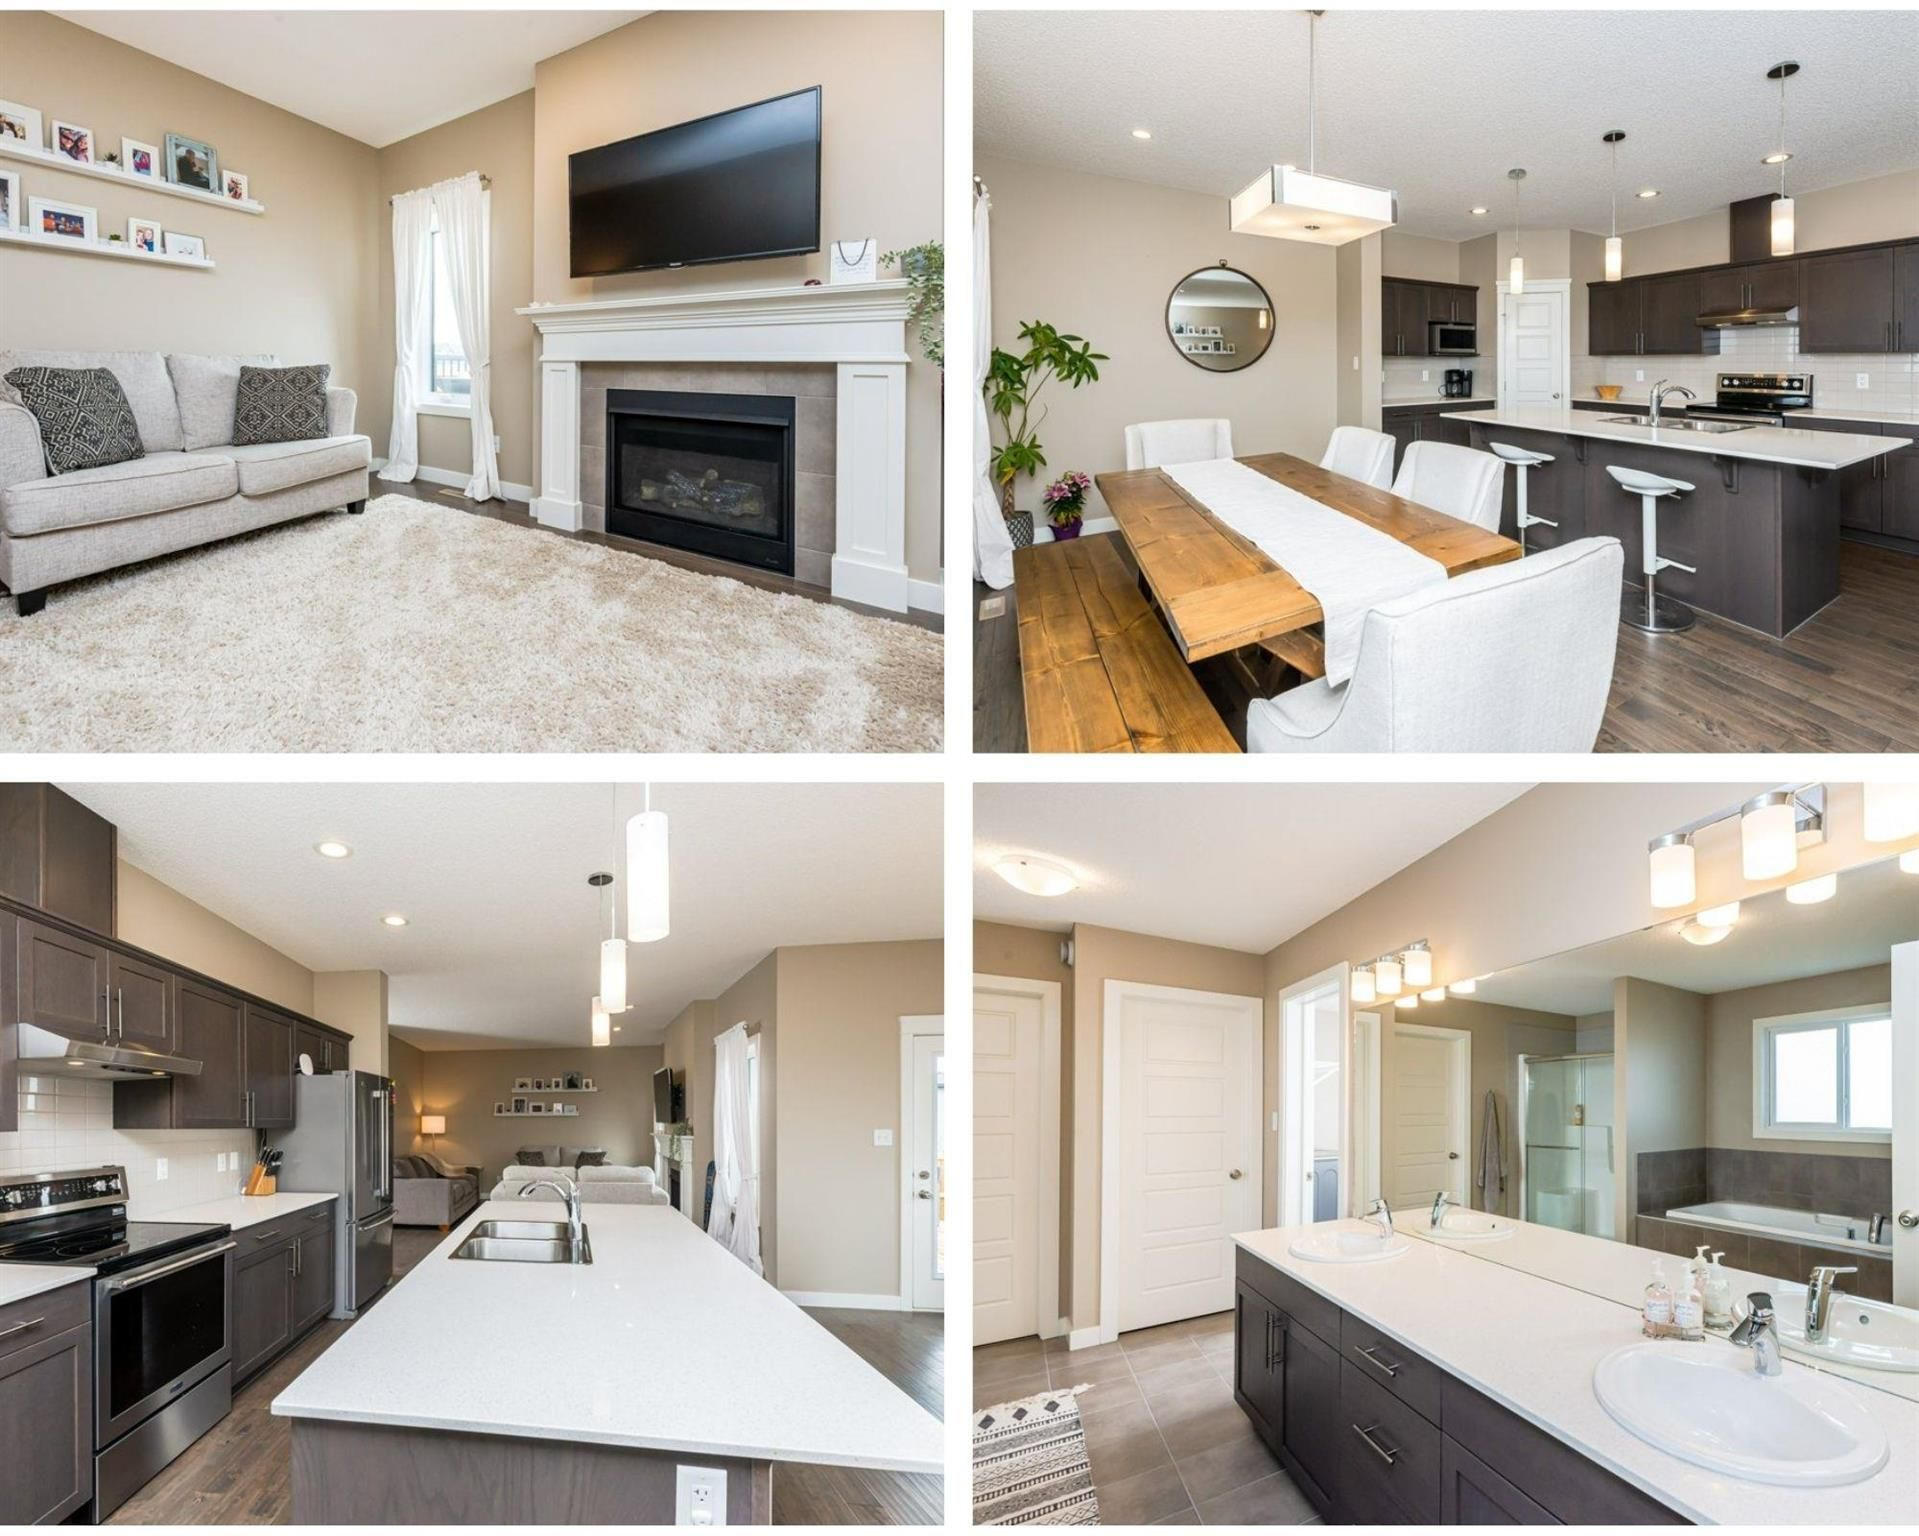 Main Photo: 2607 196 Street in Edmonton: Zone 57 House for sale : MLS®# E4248885